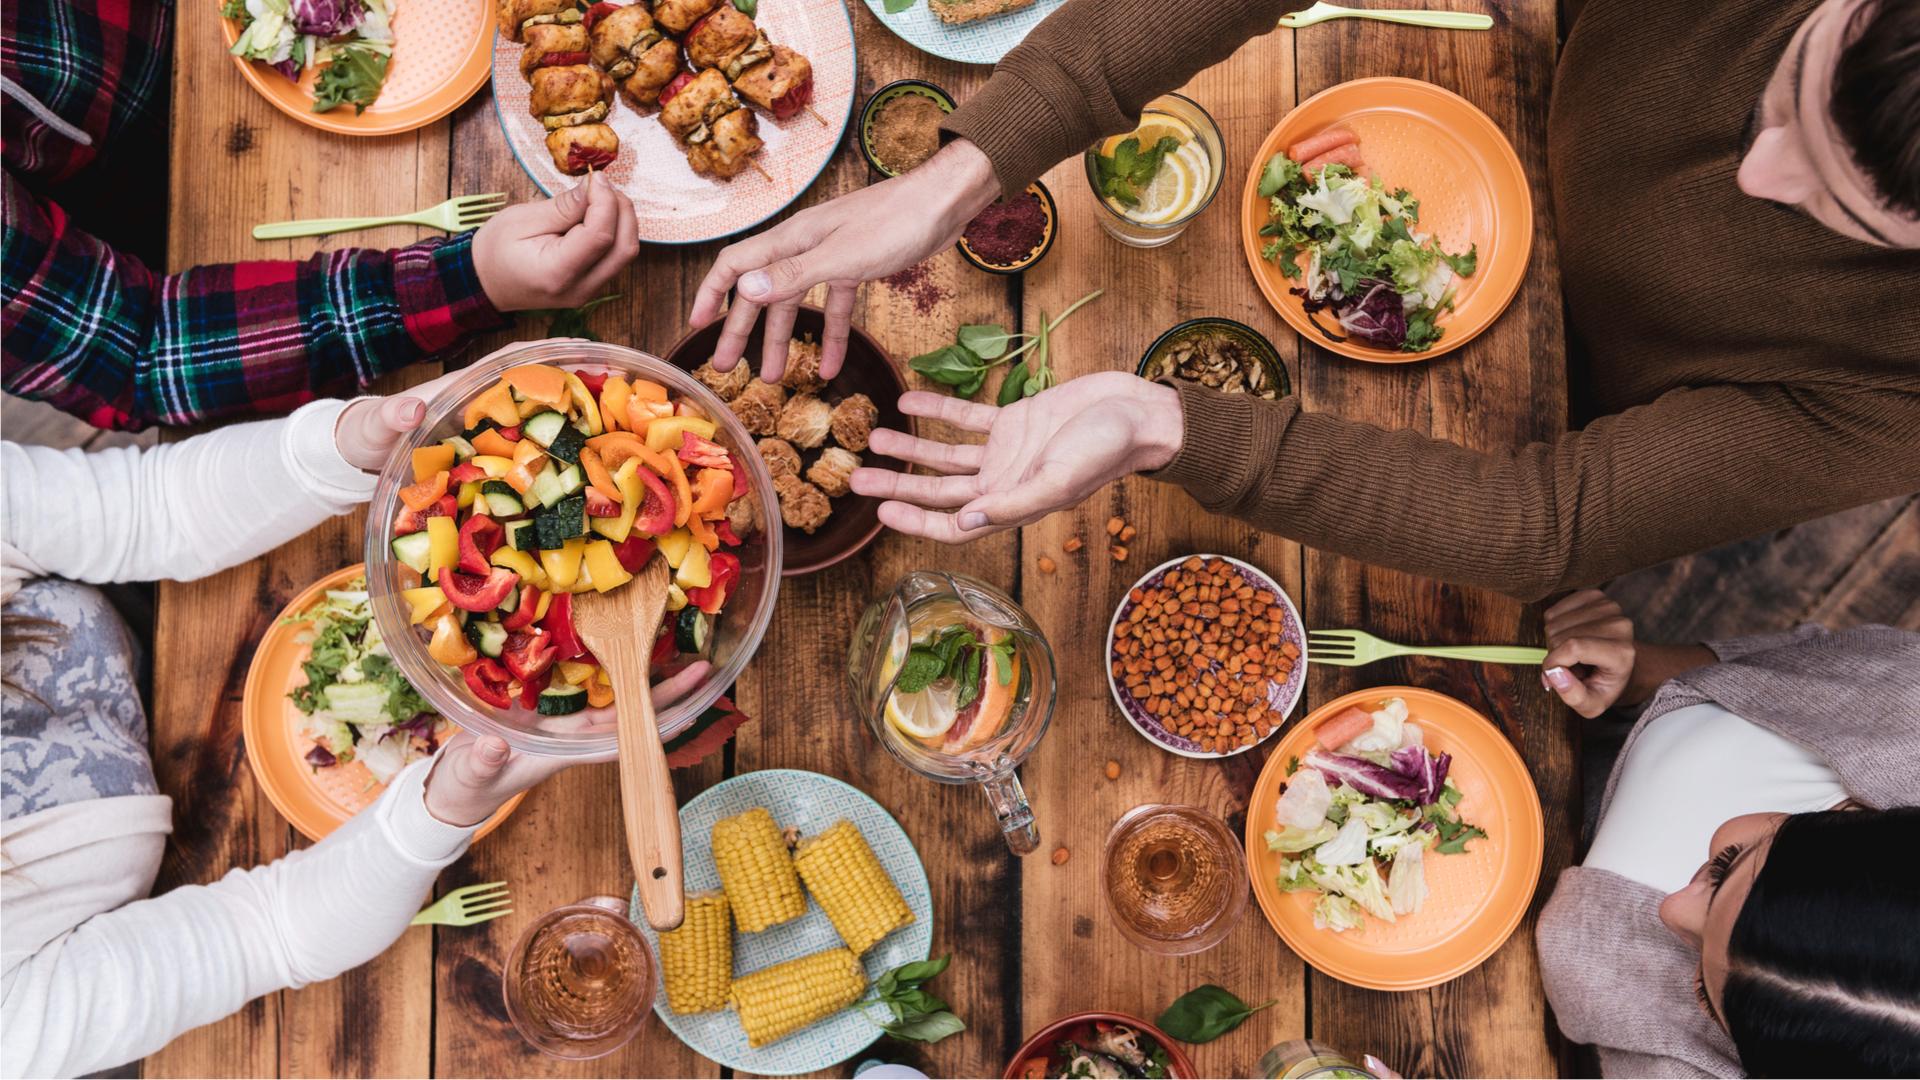 201833.lekkergezond.waaromsamenetengezonderis